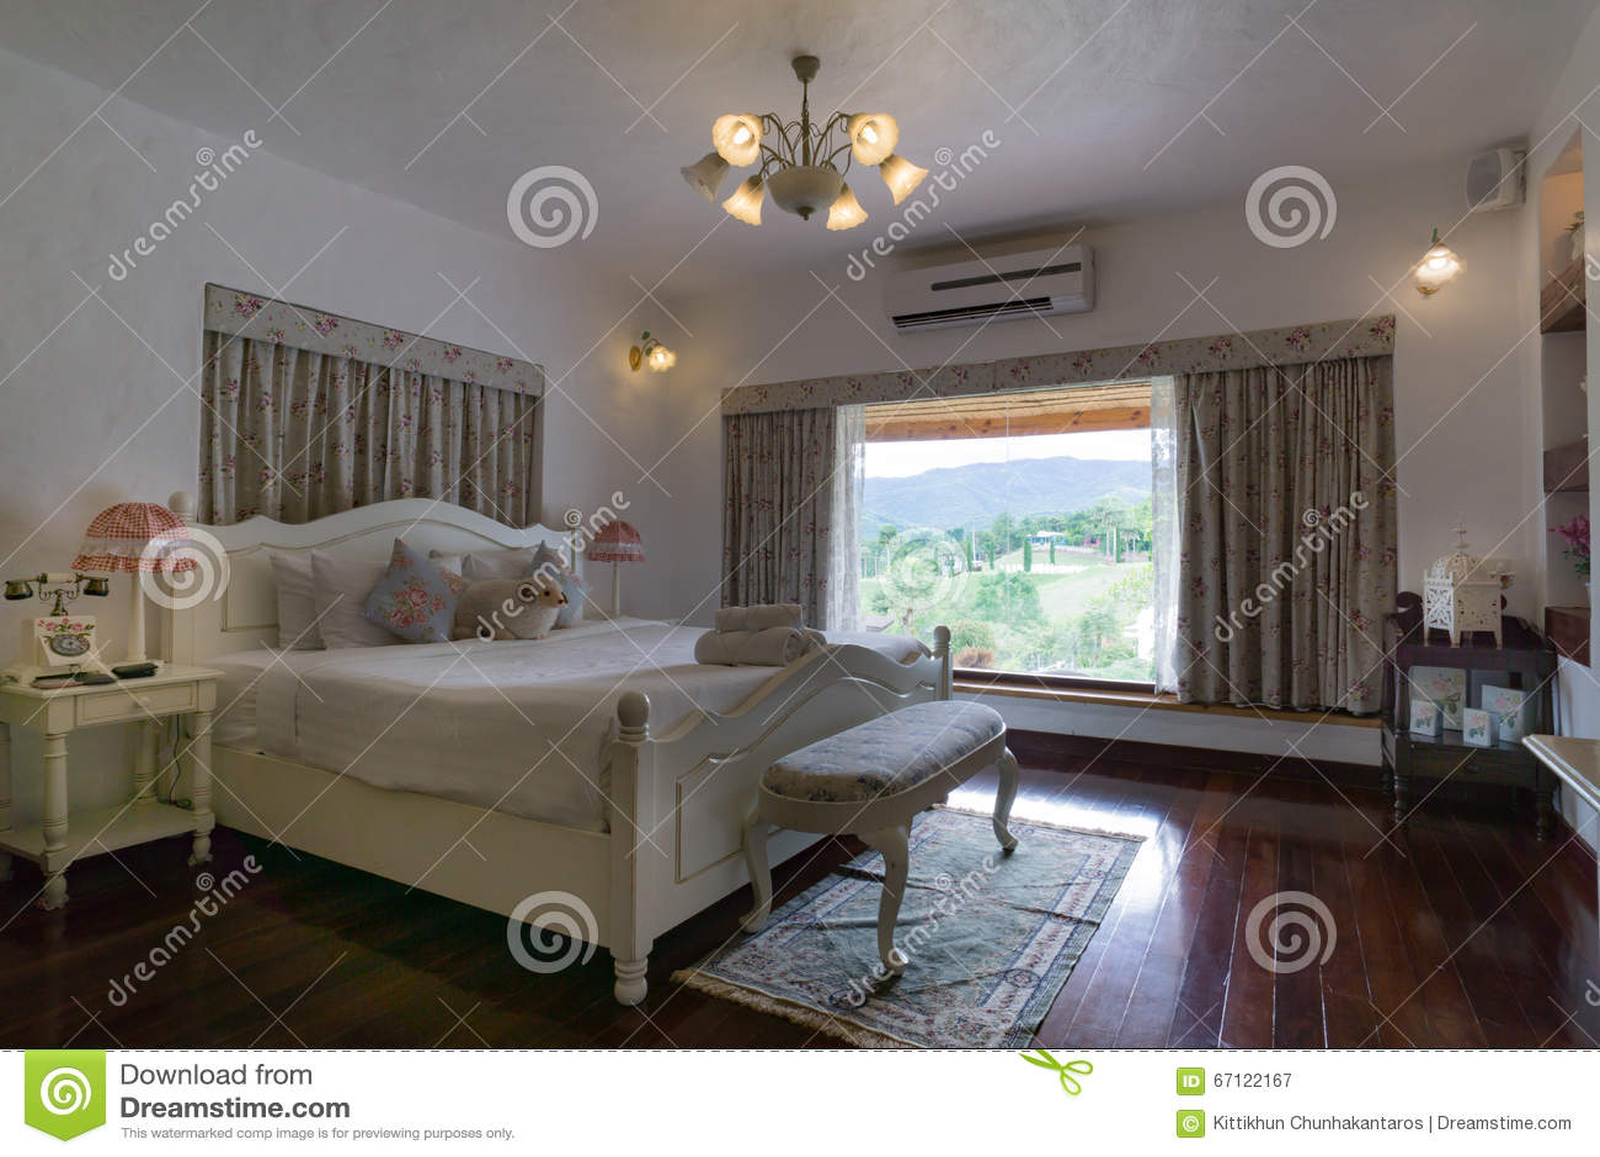 https://thumbs.dreamstime.com/z/elegante-klassieke-binnenlandse-slaapkamer-engelse-stijl-67122167.jpg